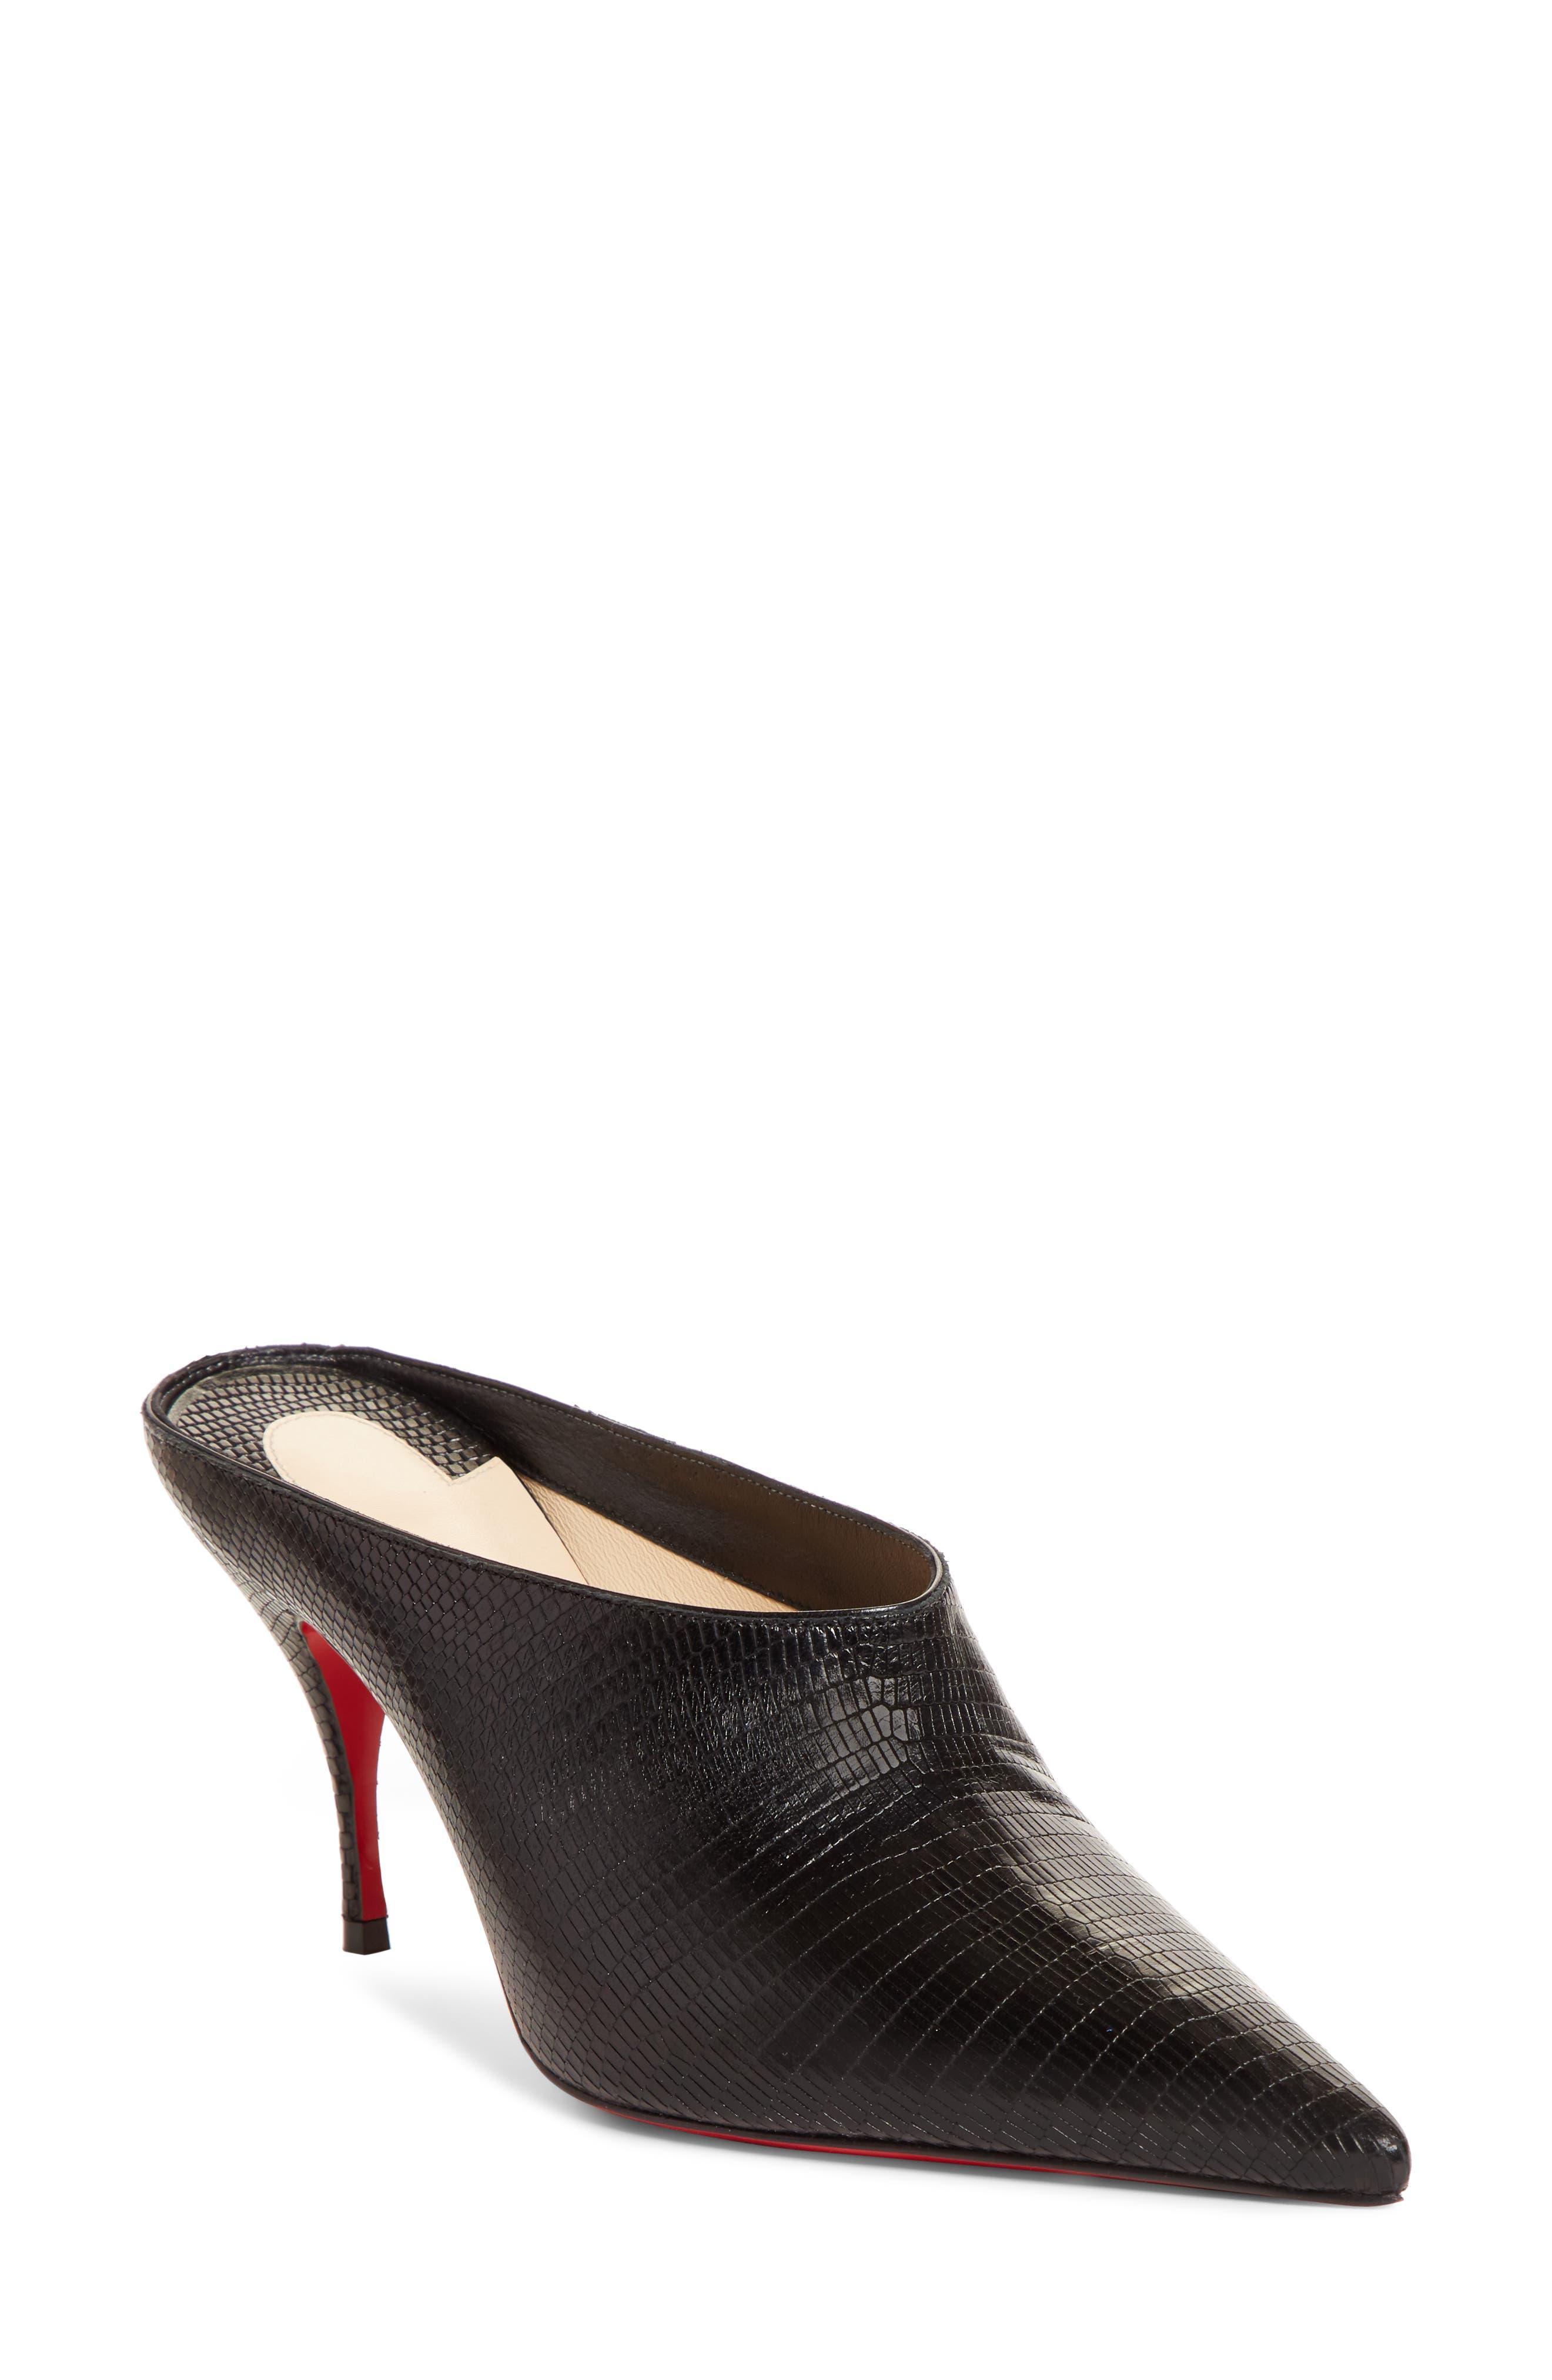 Christian Louboutin Quart Pointy Toe Mule - Black